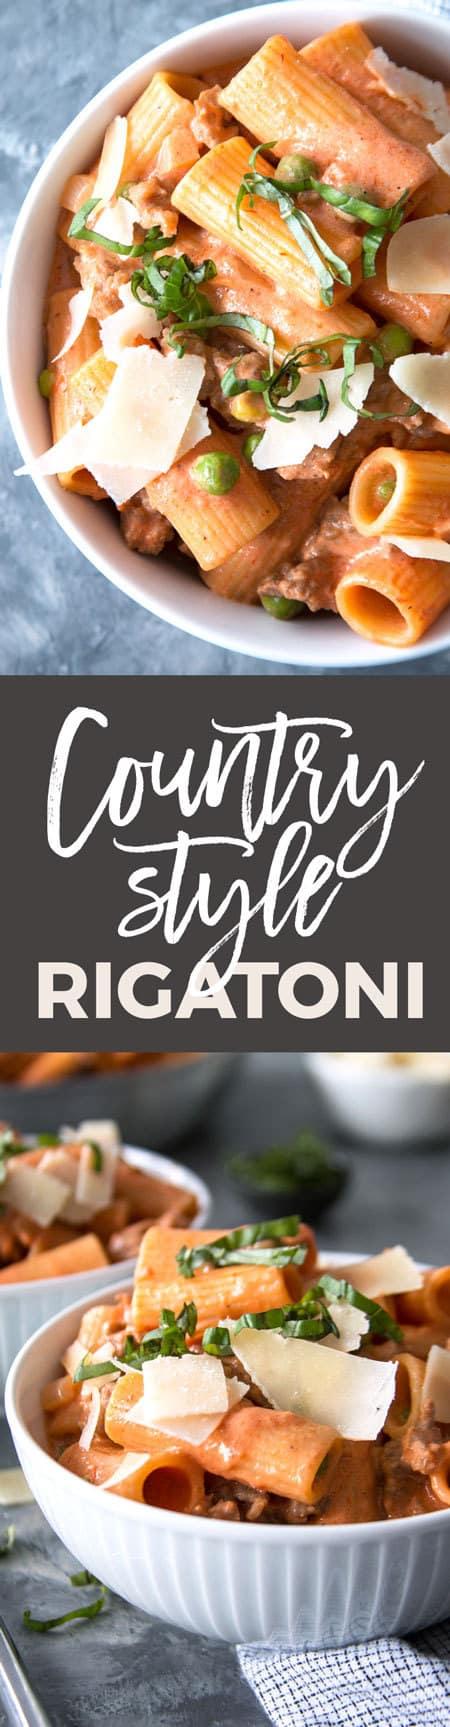 Country-Style Rigatoni Recipe pin